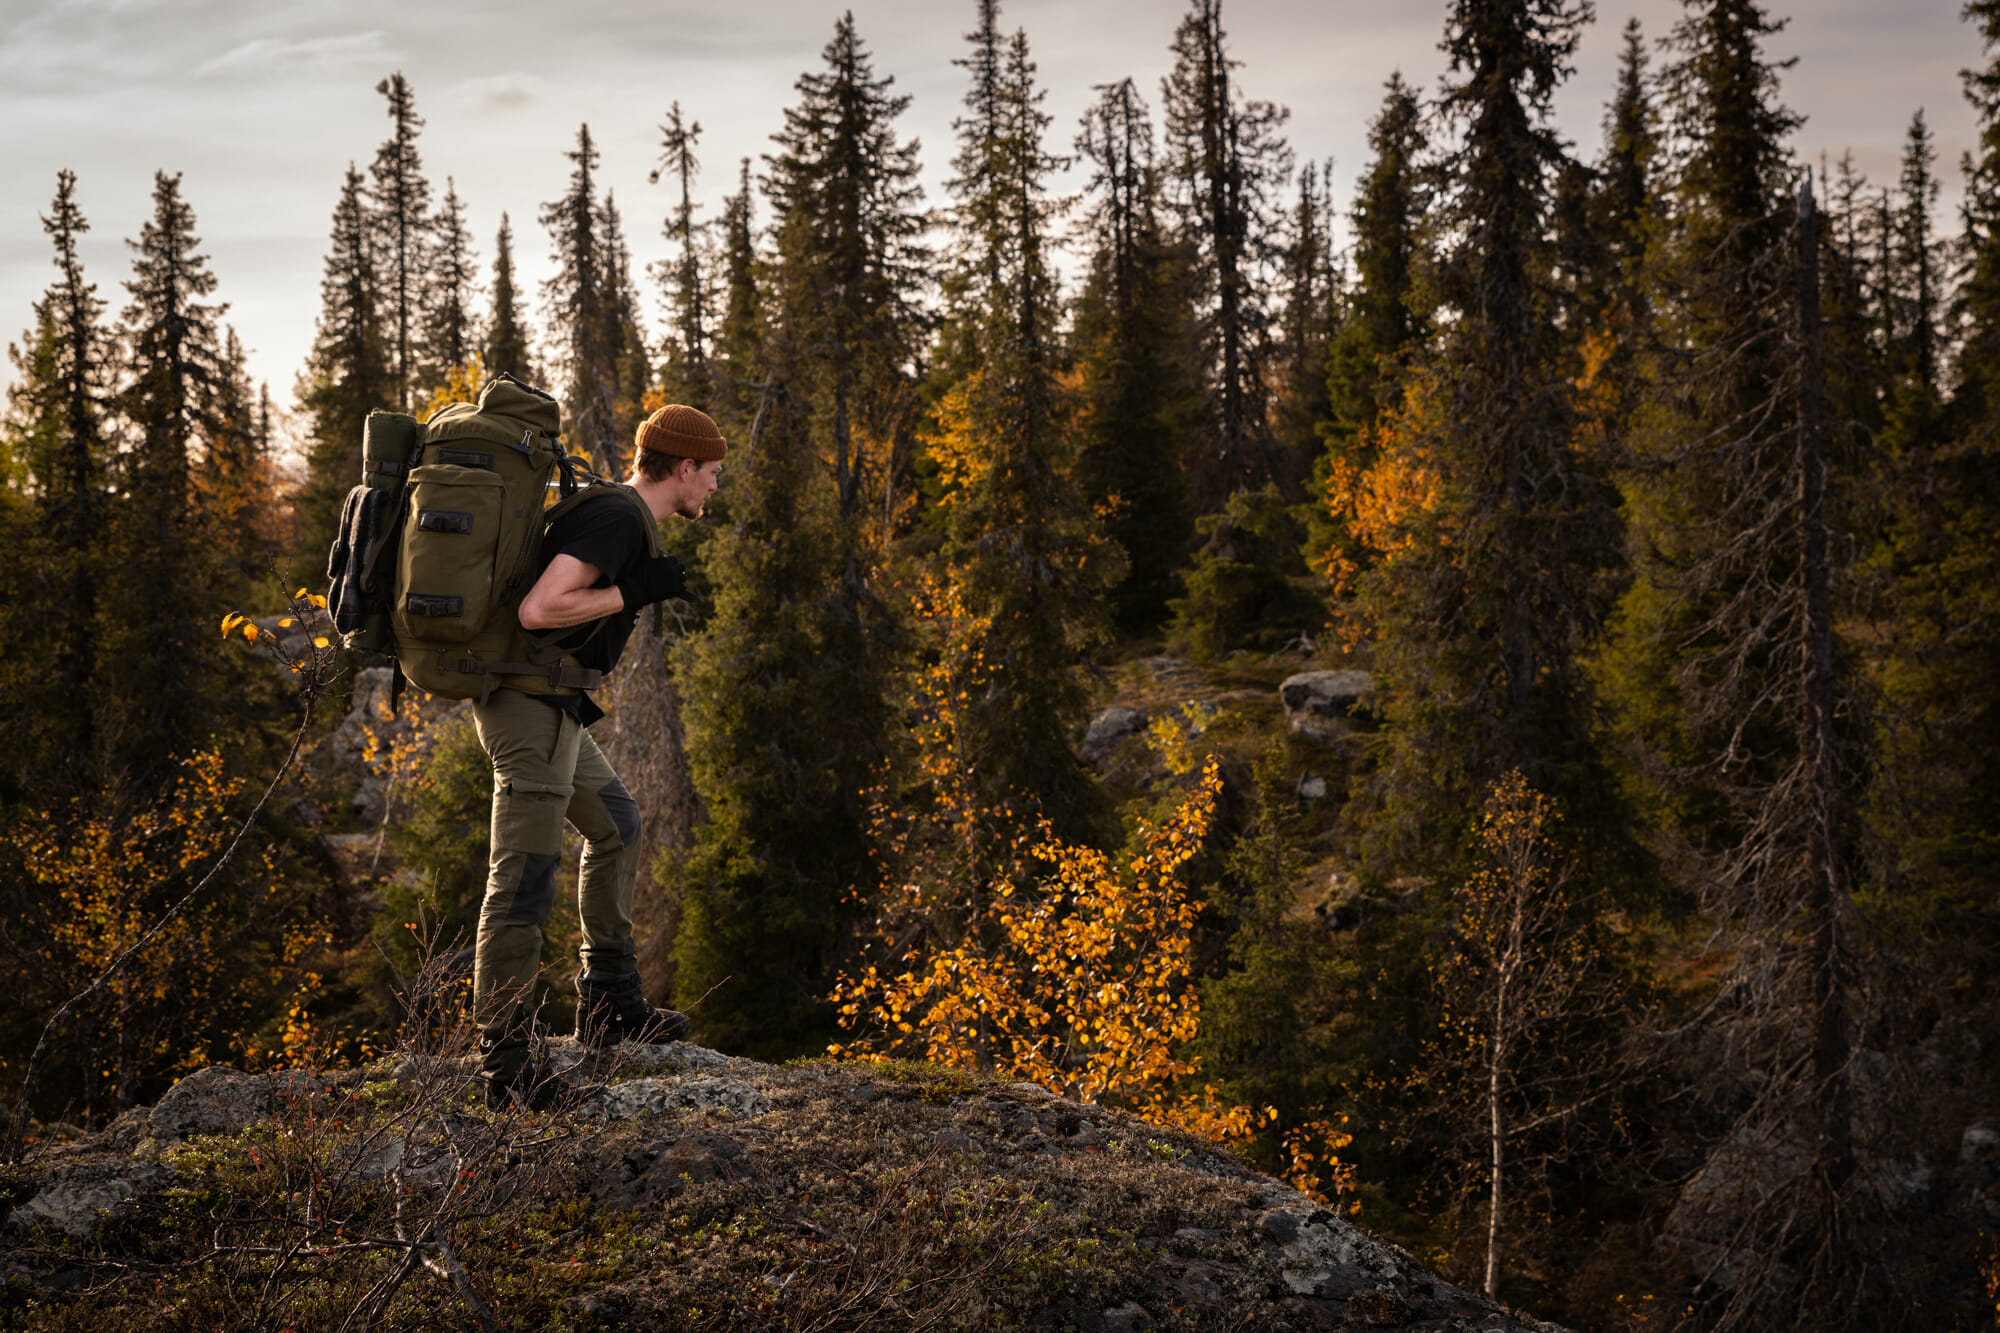 Canyon en Laponie finlandaise